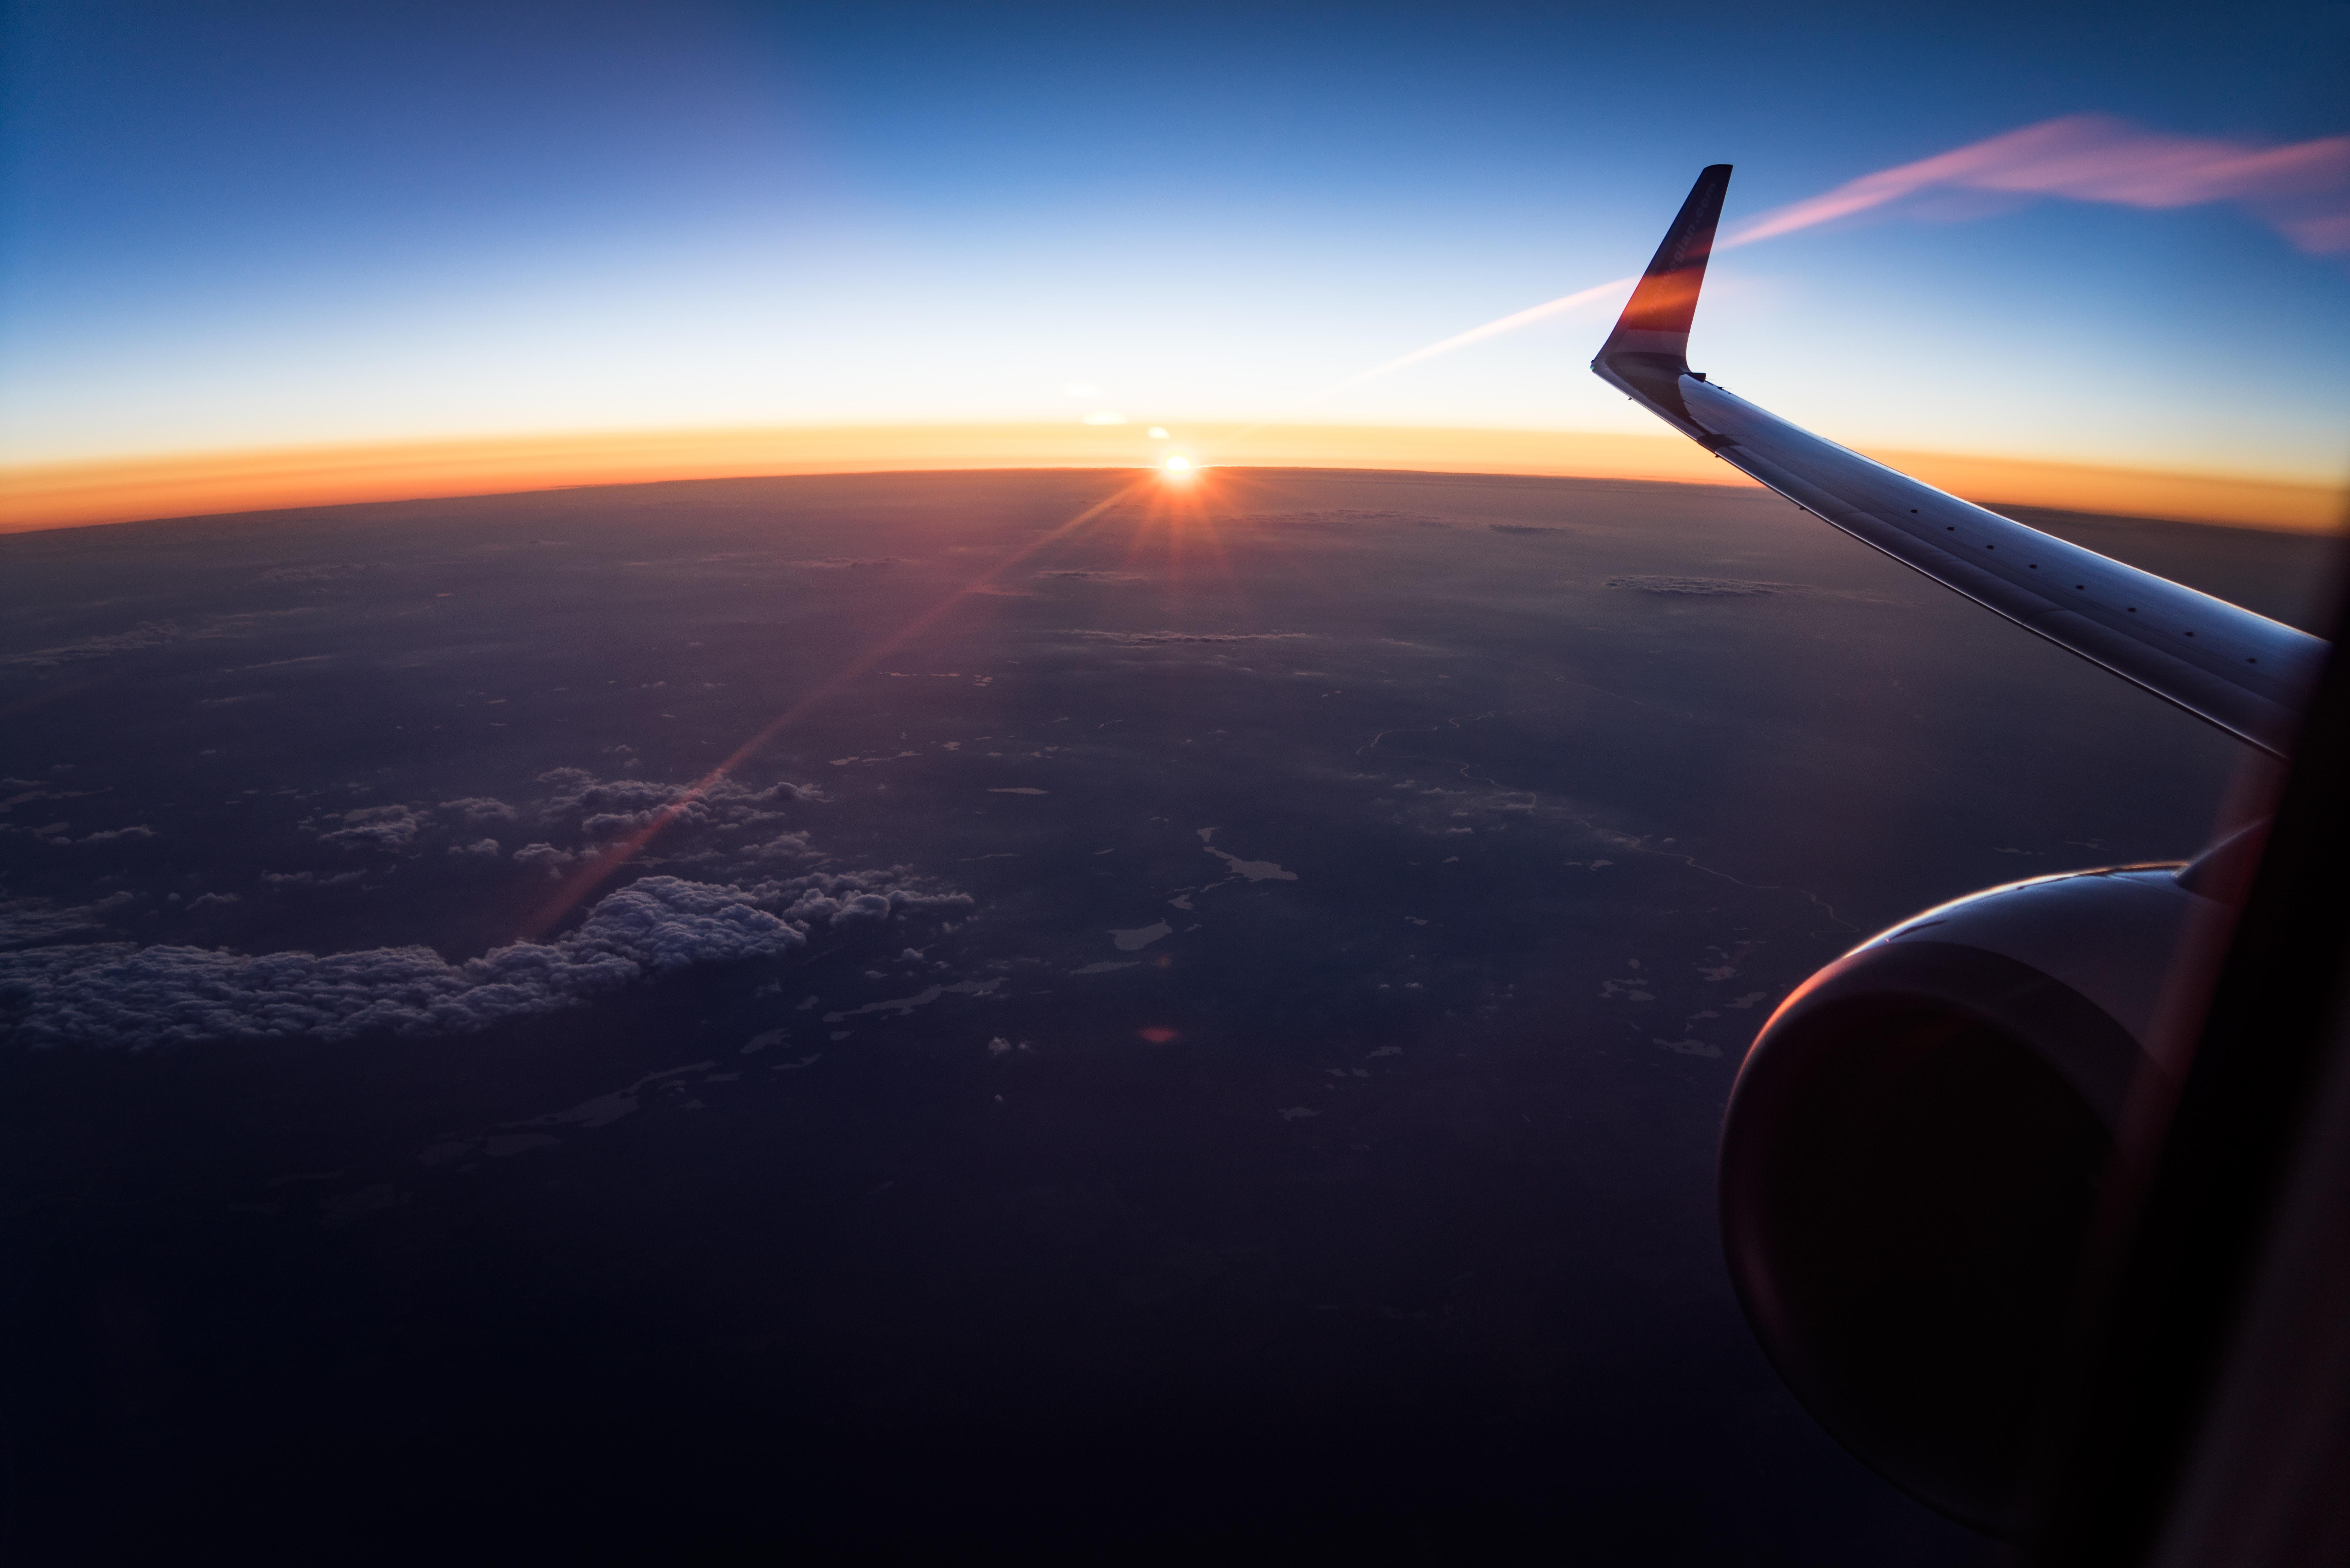 plate-flight-sky-sunset-91217